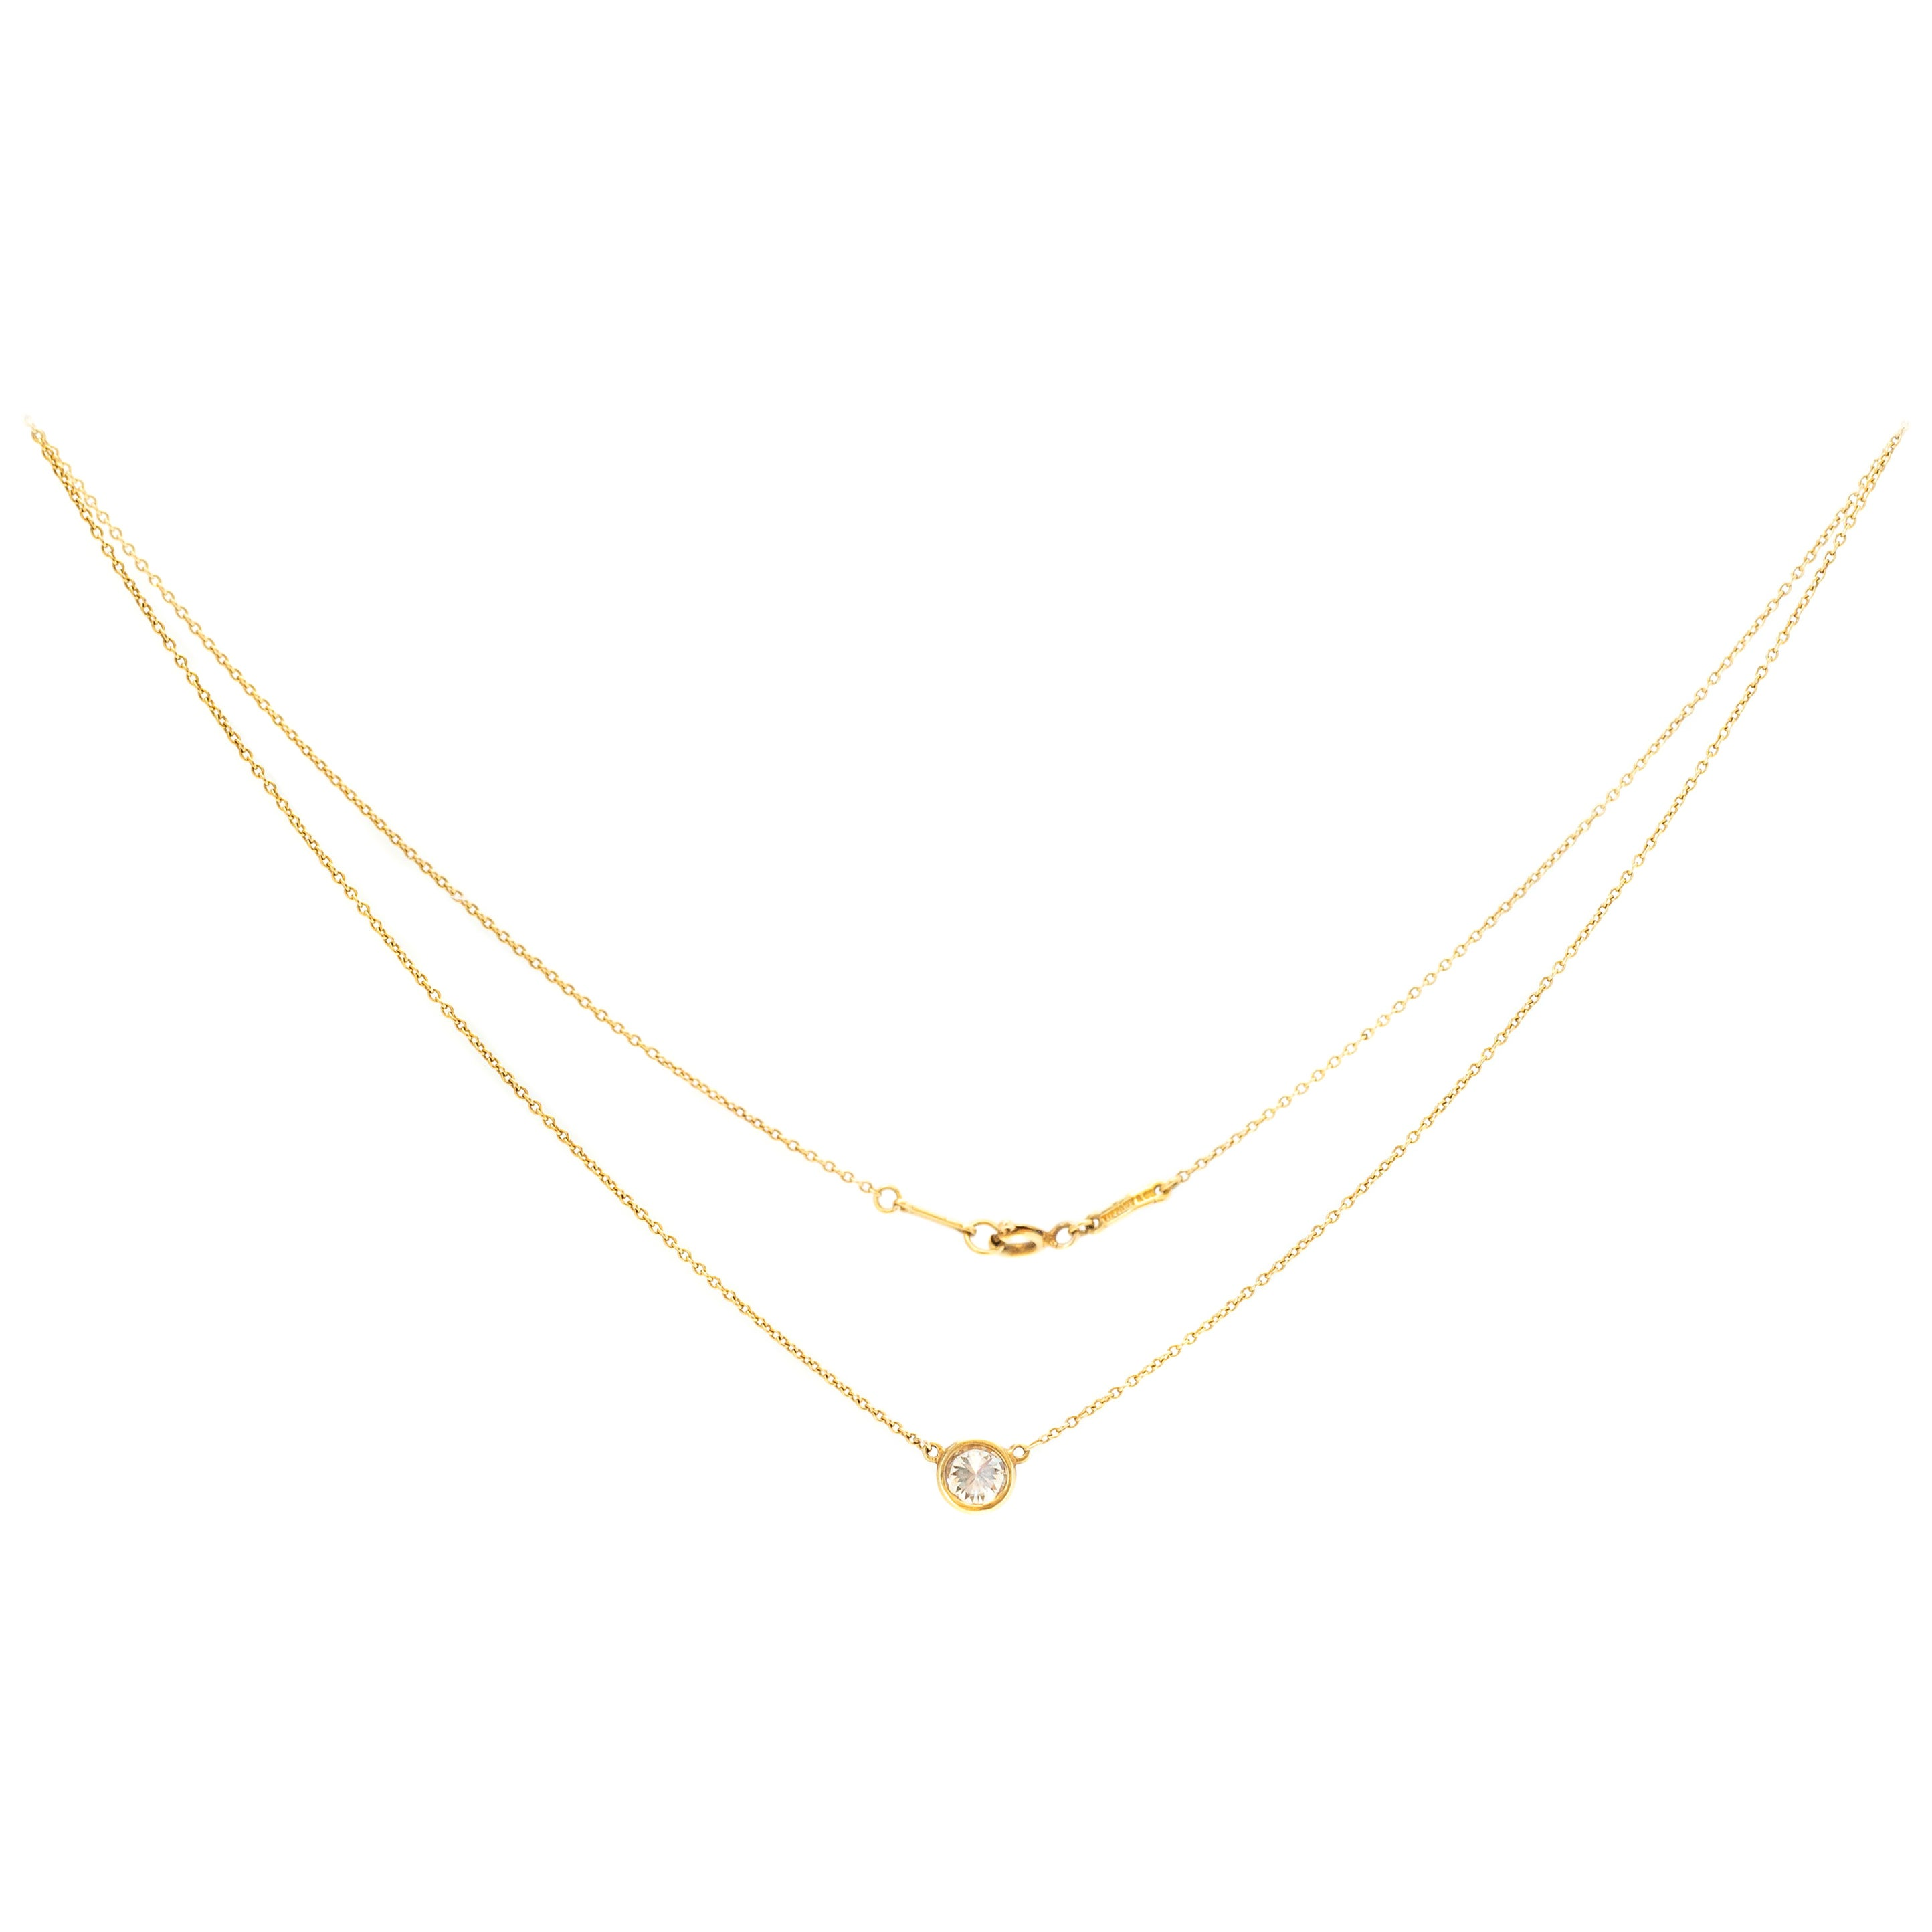 Tiffany & Co. Elsa Peretti Diamonds by the Yard Pendant Necklace